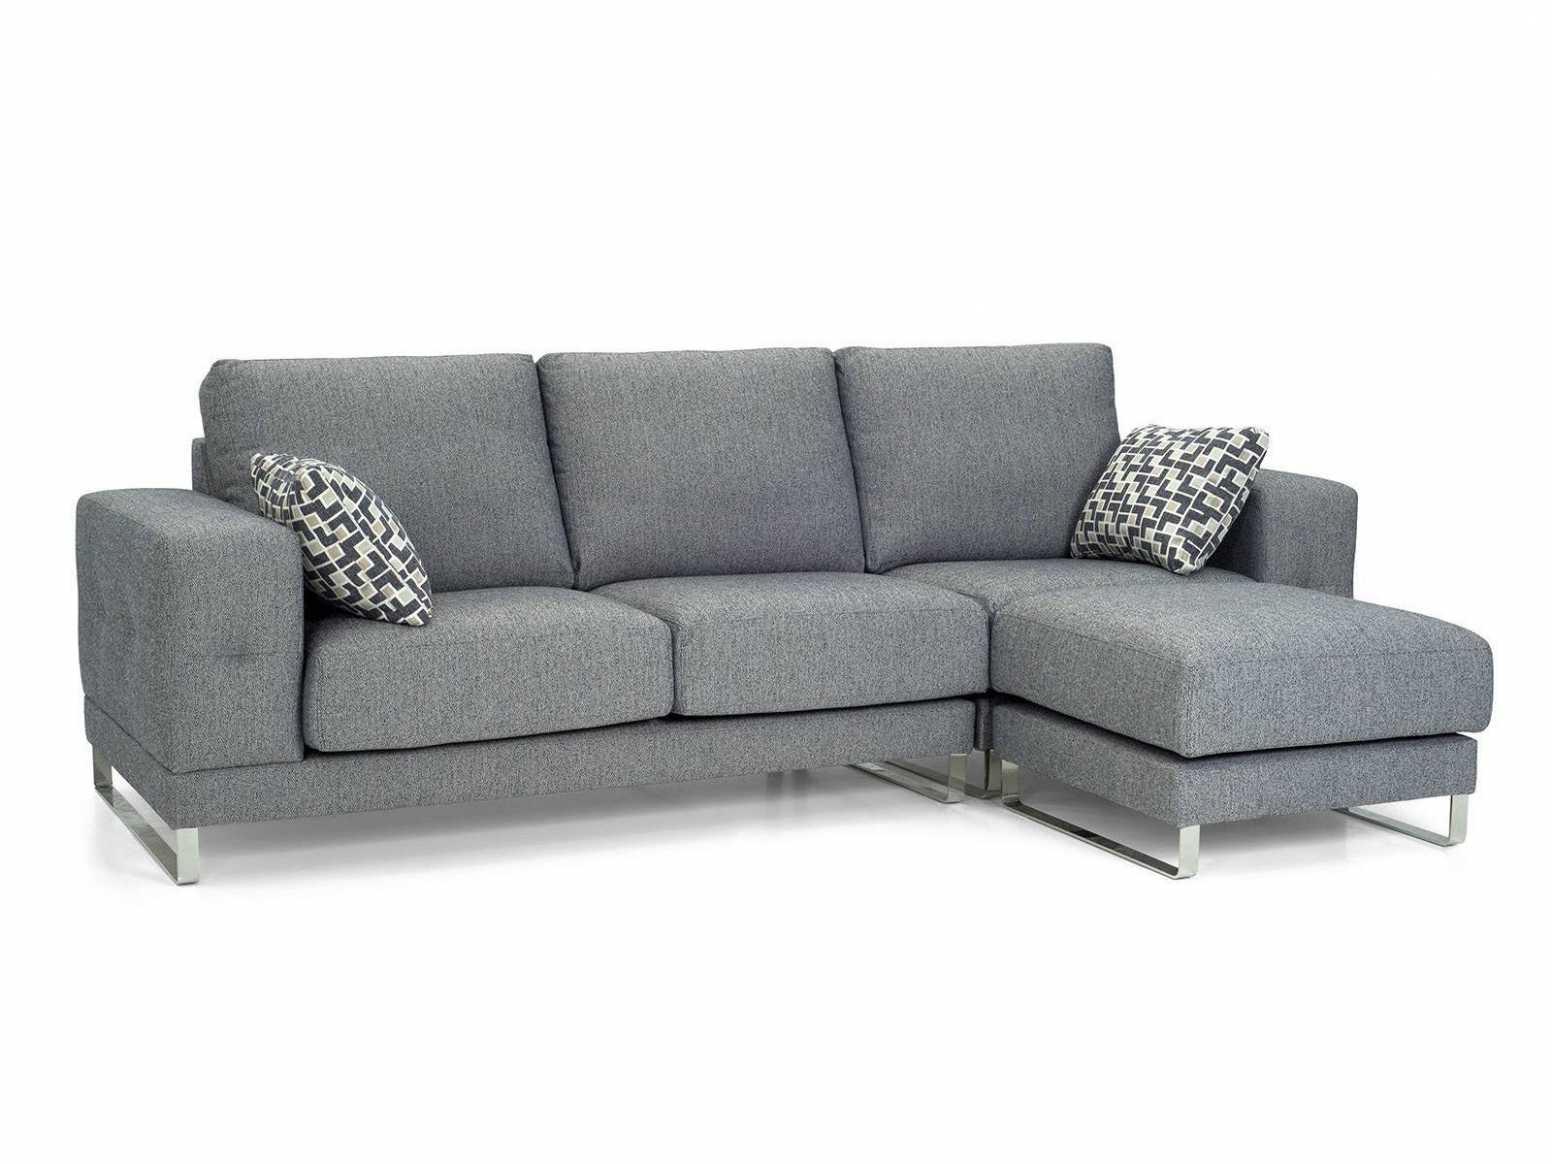 Merkamueble sofas S5d8 Merkamueble sofas Cheslong Diseno De Interiores Publum